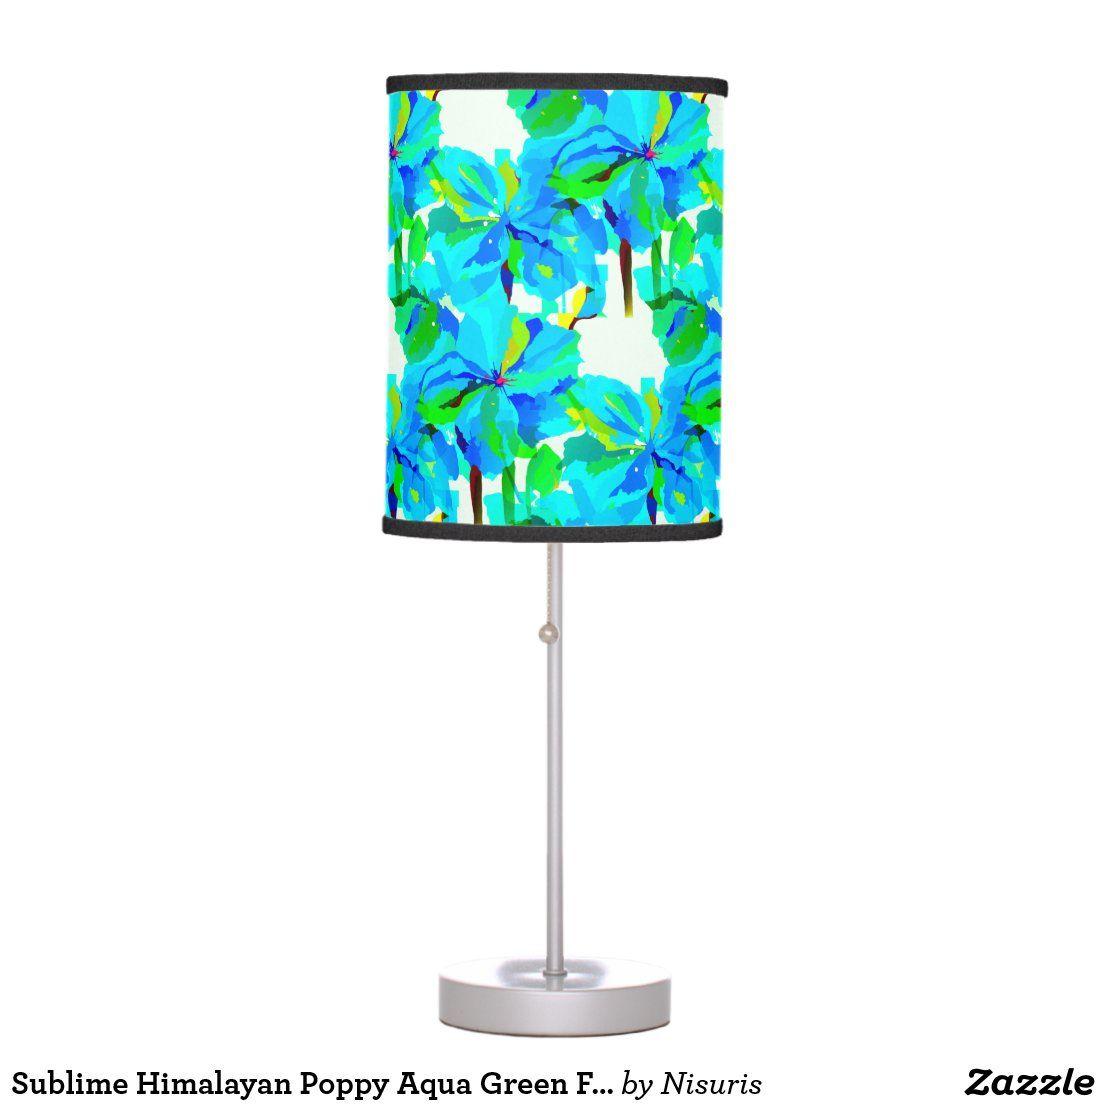 Sublime Himalayan Poppy Aqua Green Floral Pattern Table Lamp Zazzle Com Aqua Green Table Lamp Lamp